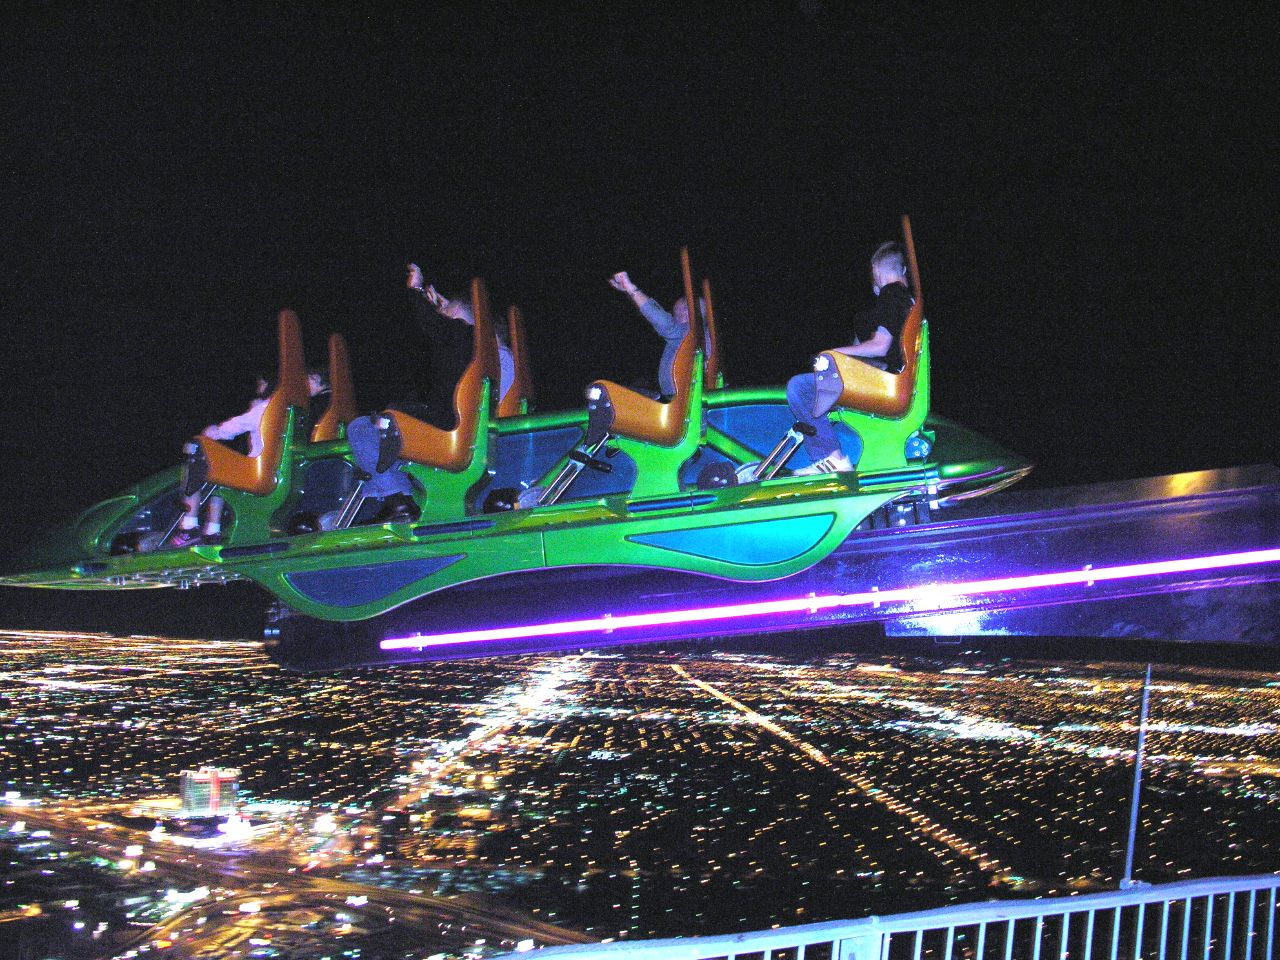 X Scream - Stratosphere Tower - Las Vegas | Flickr - Photo ...